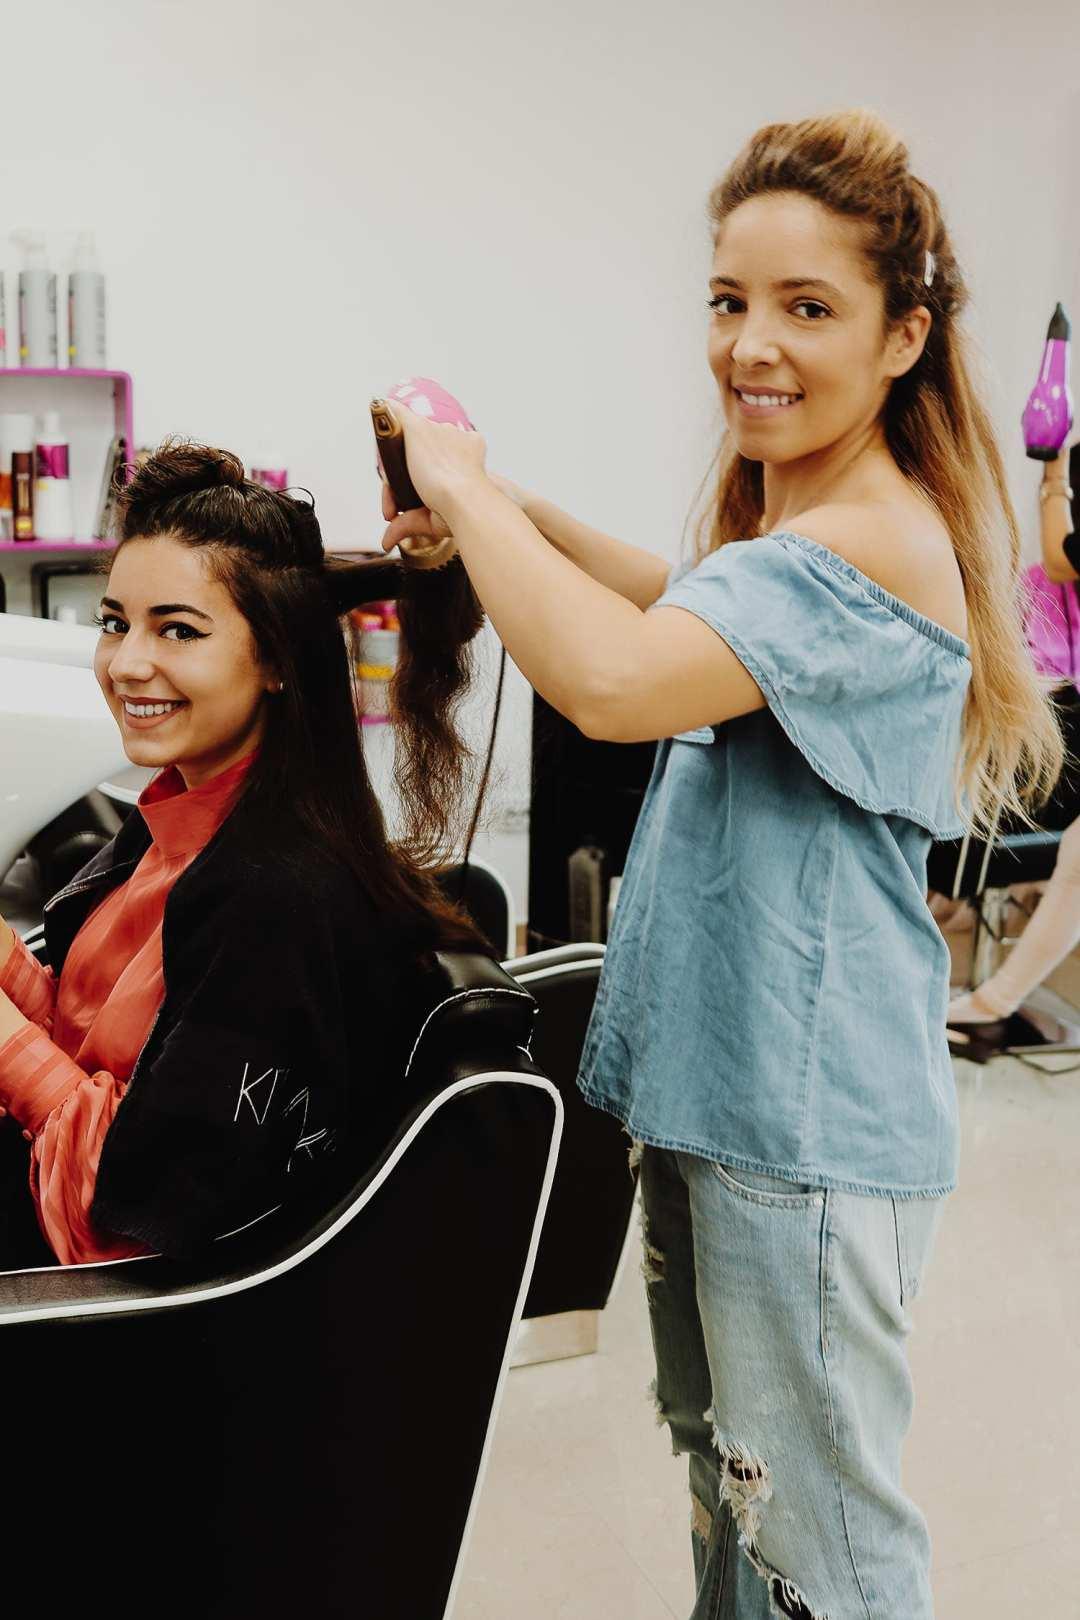 londa professional fiber infusion pret salon roxi rose tratament cheratina par cret efecte keratina pareri review beauty blog romania timisoara fashion lstudio timisoara laura jivan (47)